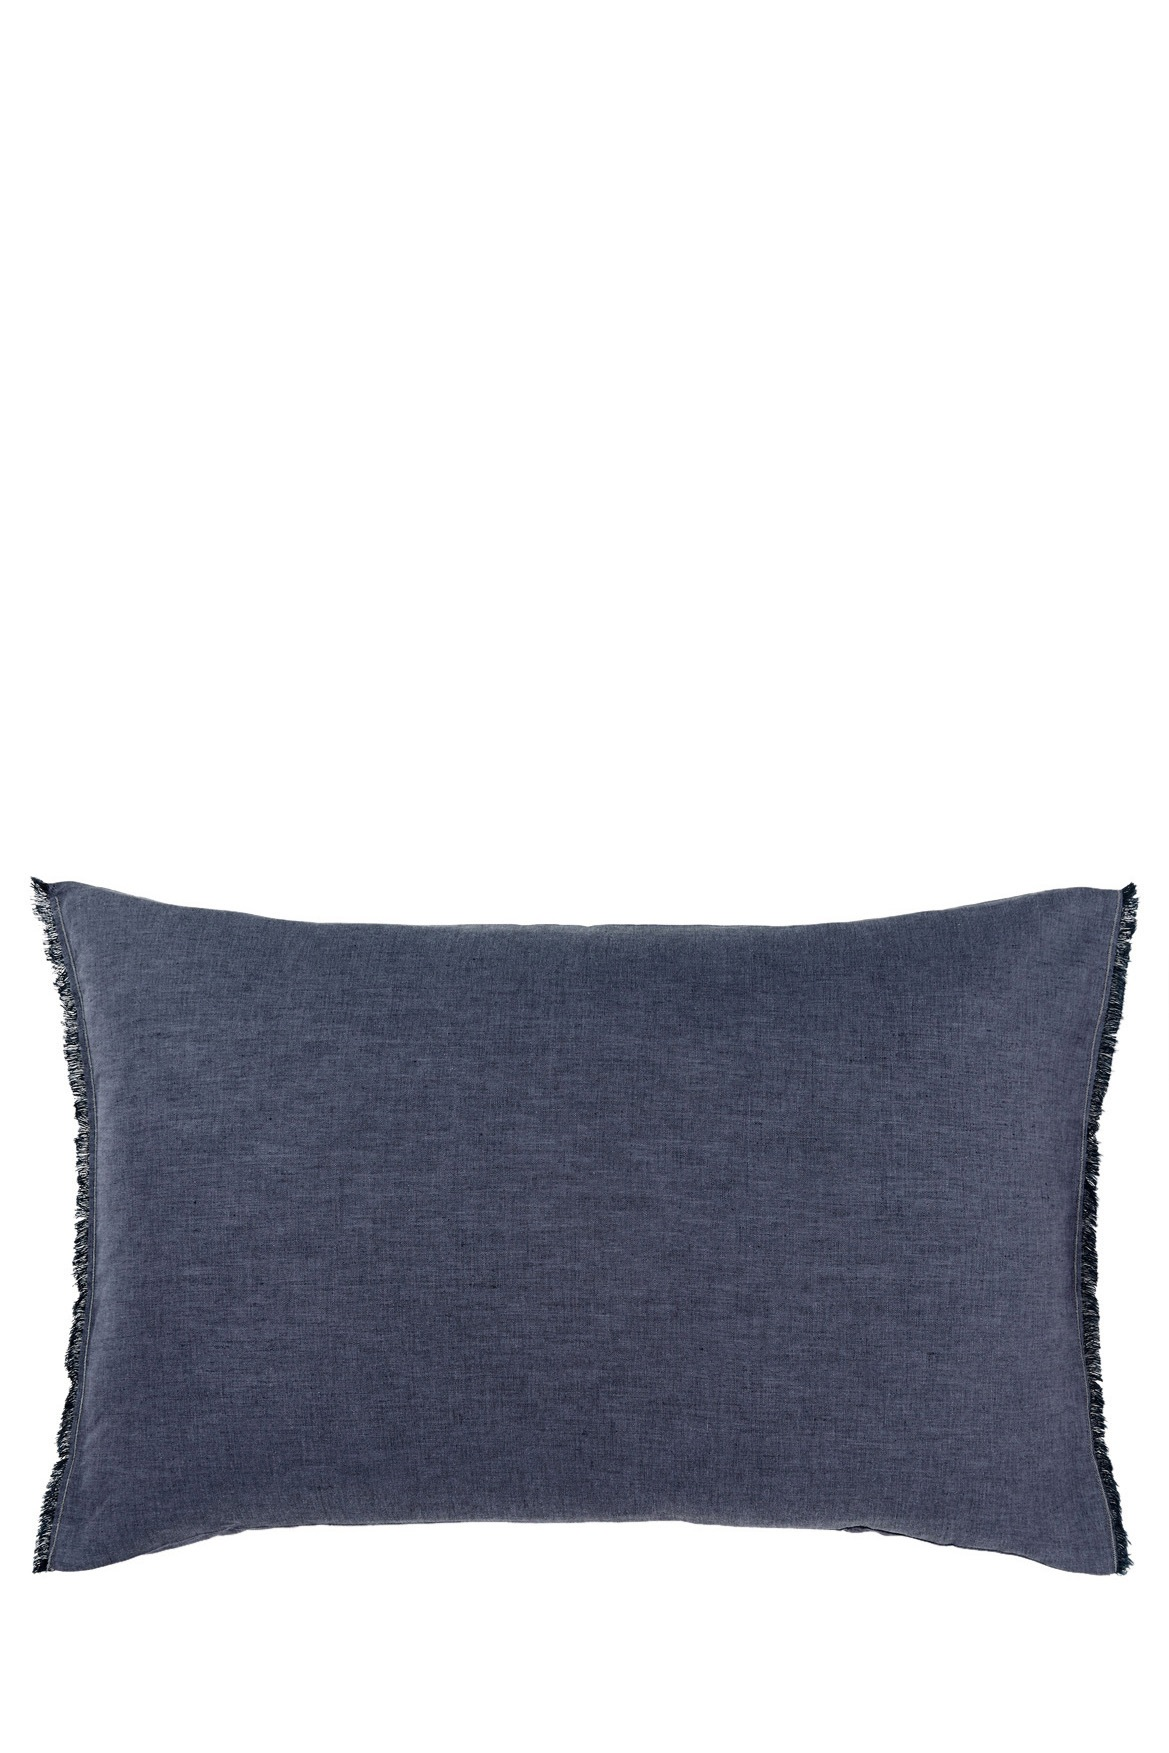 Aura by tracie ellis chambray fringe range in indigo for Tracie ellis bedding